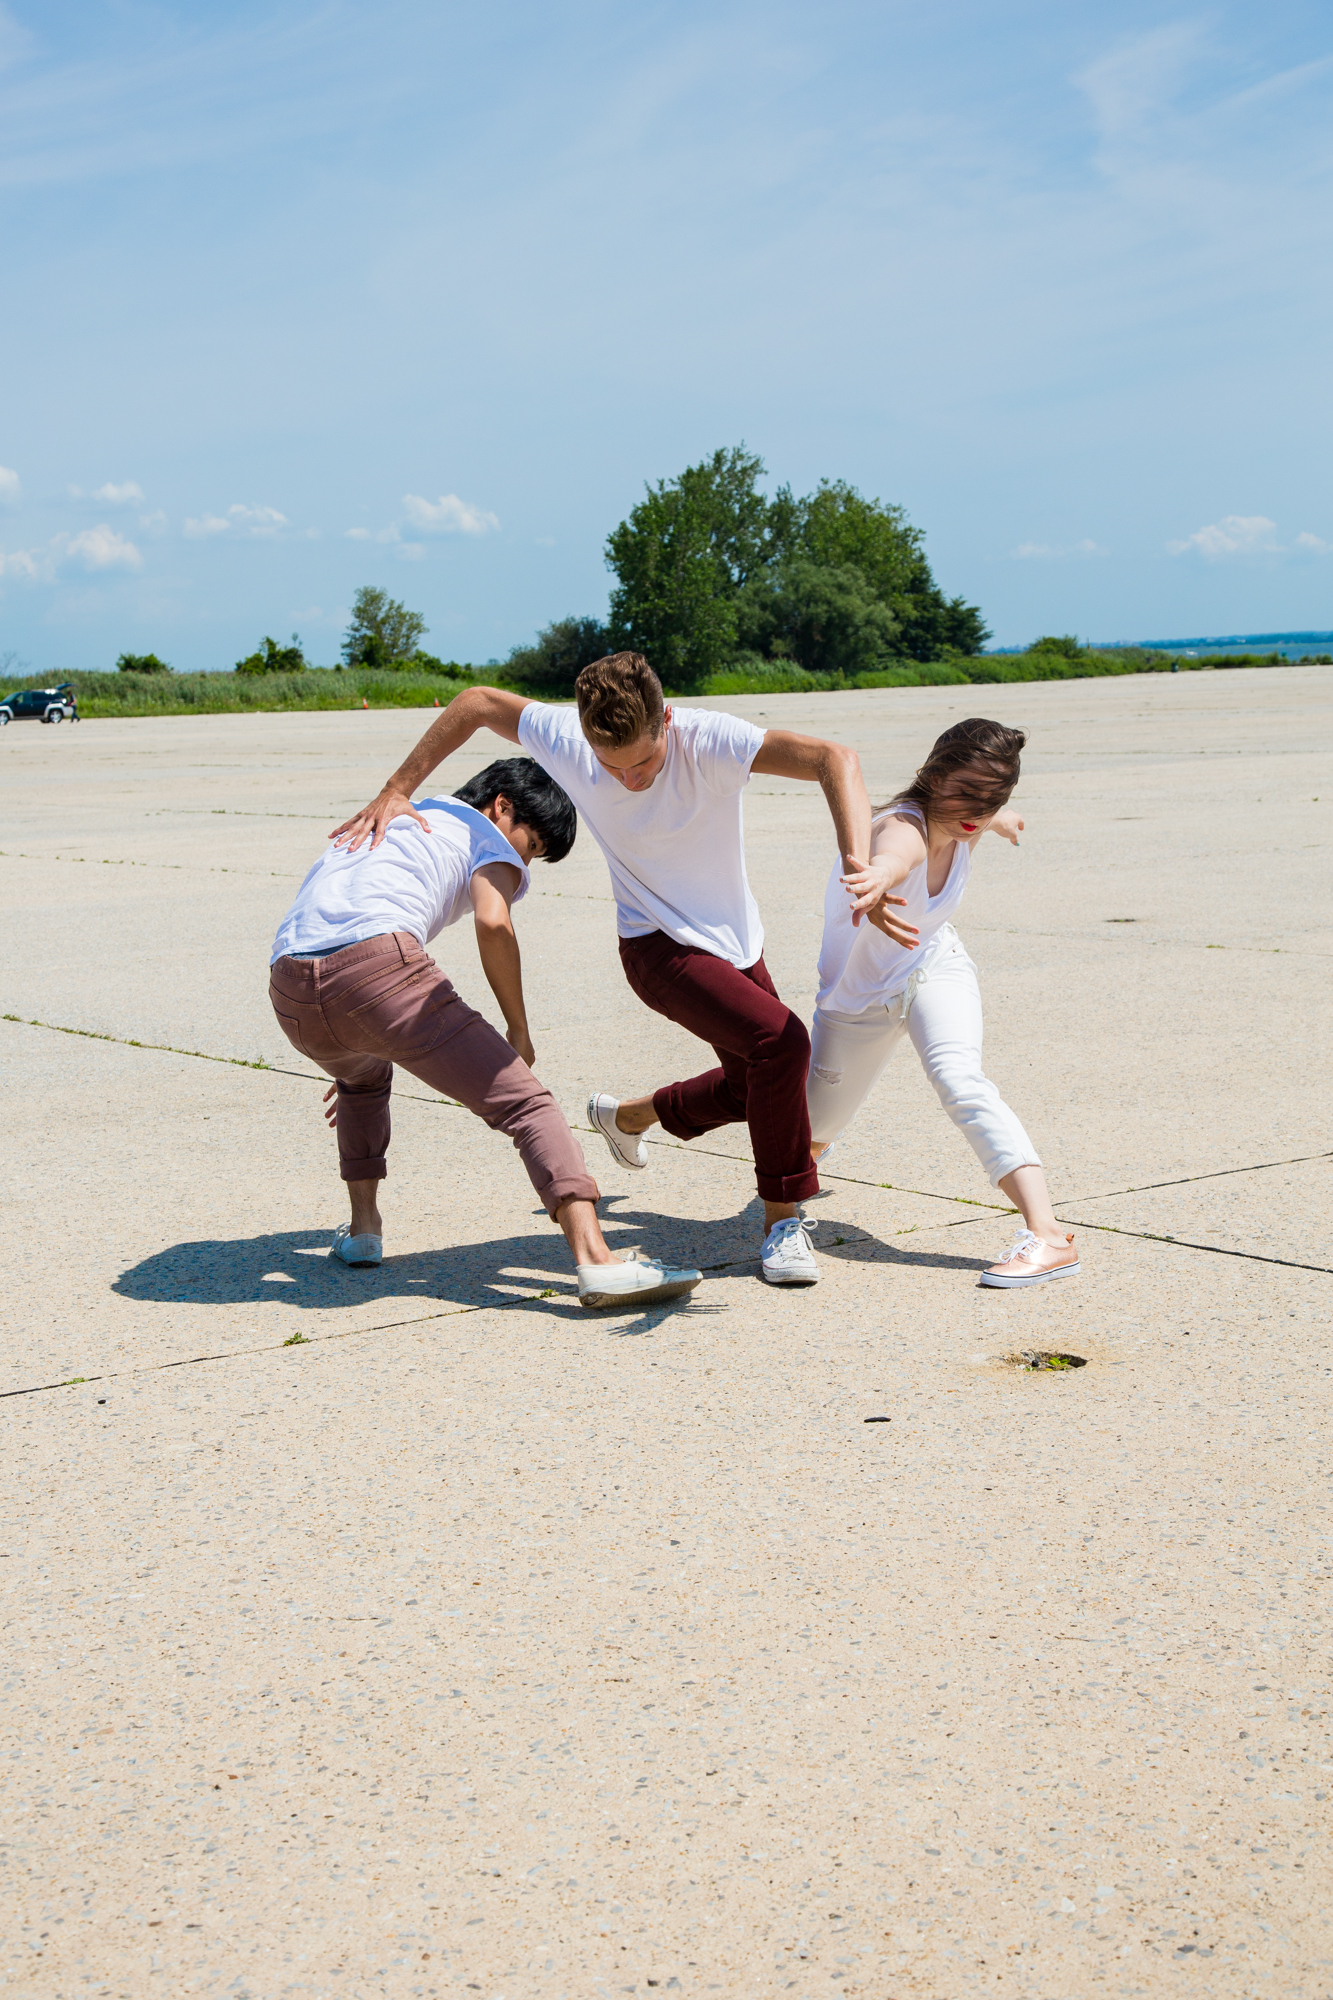 Rockaway Summer Dance Series_Photos by Daniel Terna_FIRST ROUGH SELECTS-16.jpg